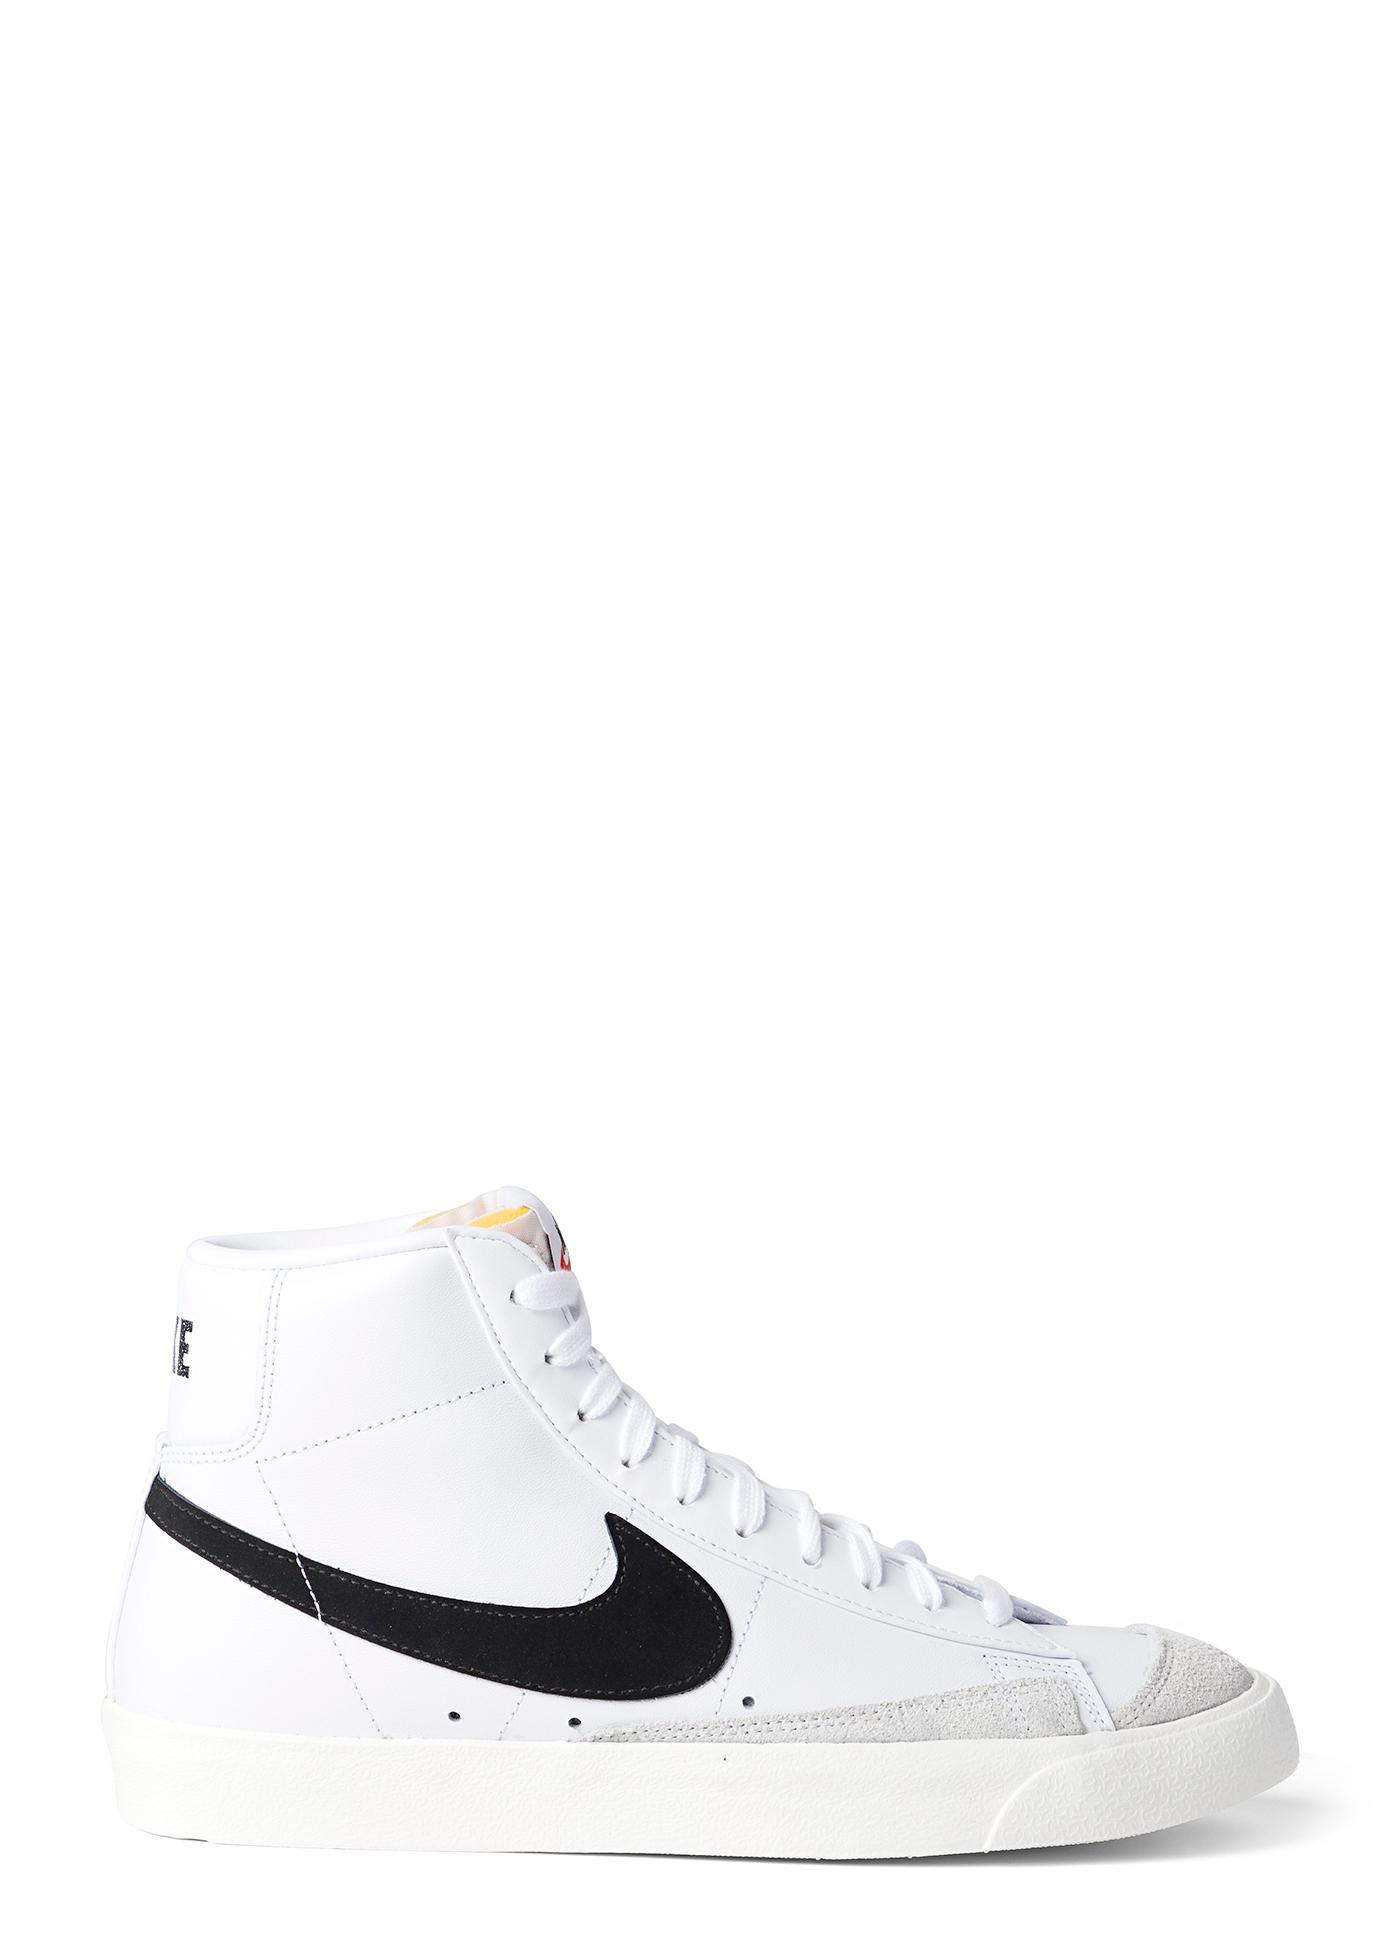 Nike Blazer Mid '77 Vintage image number 0